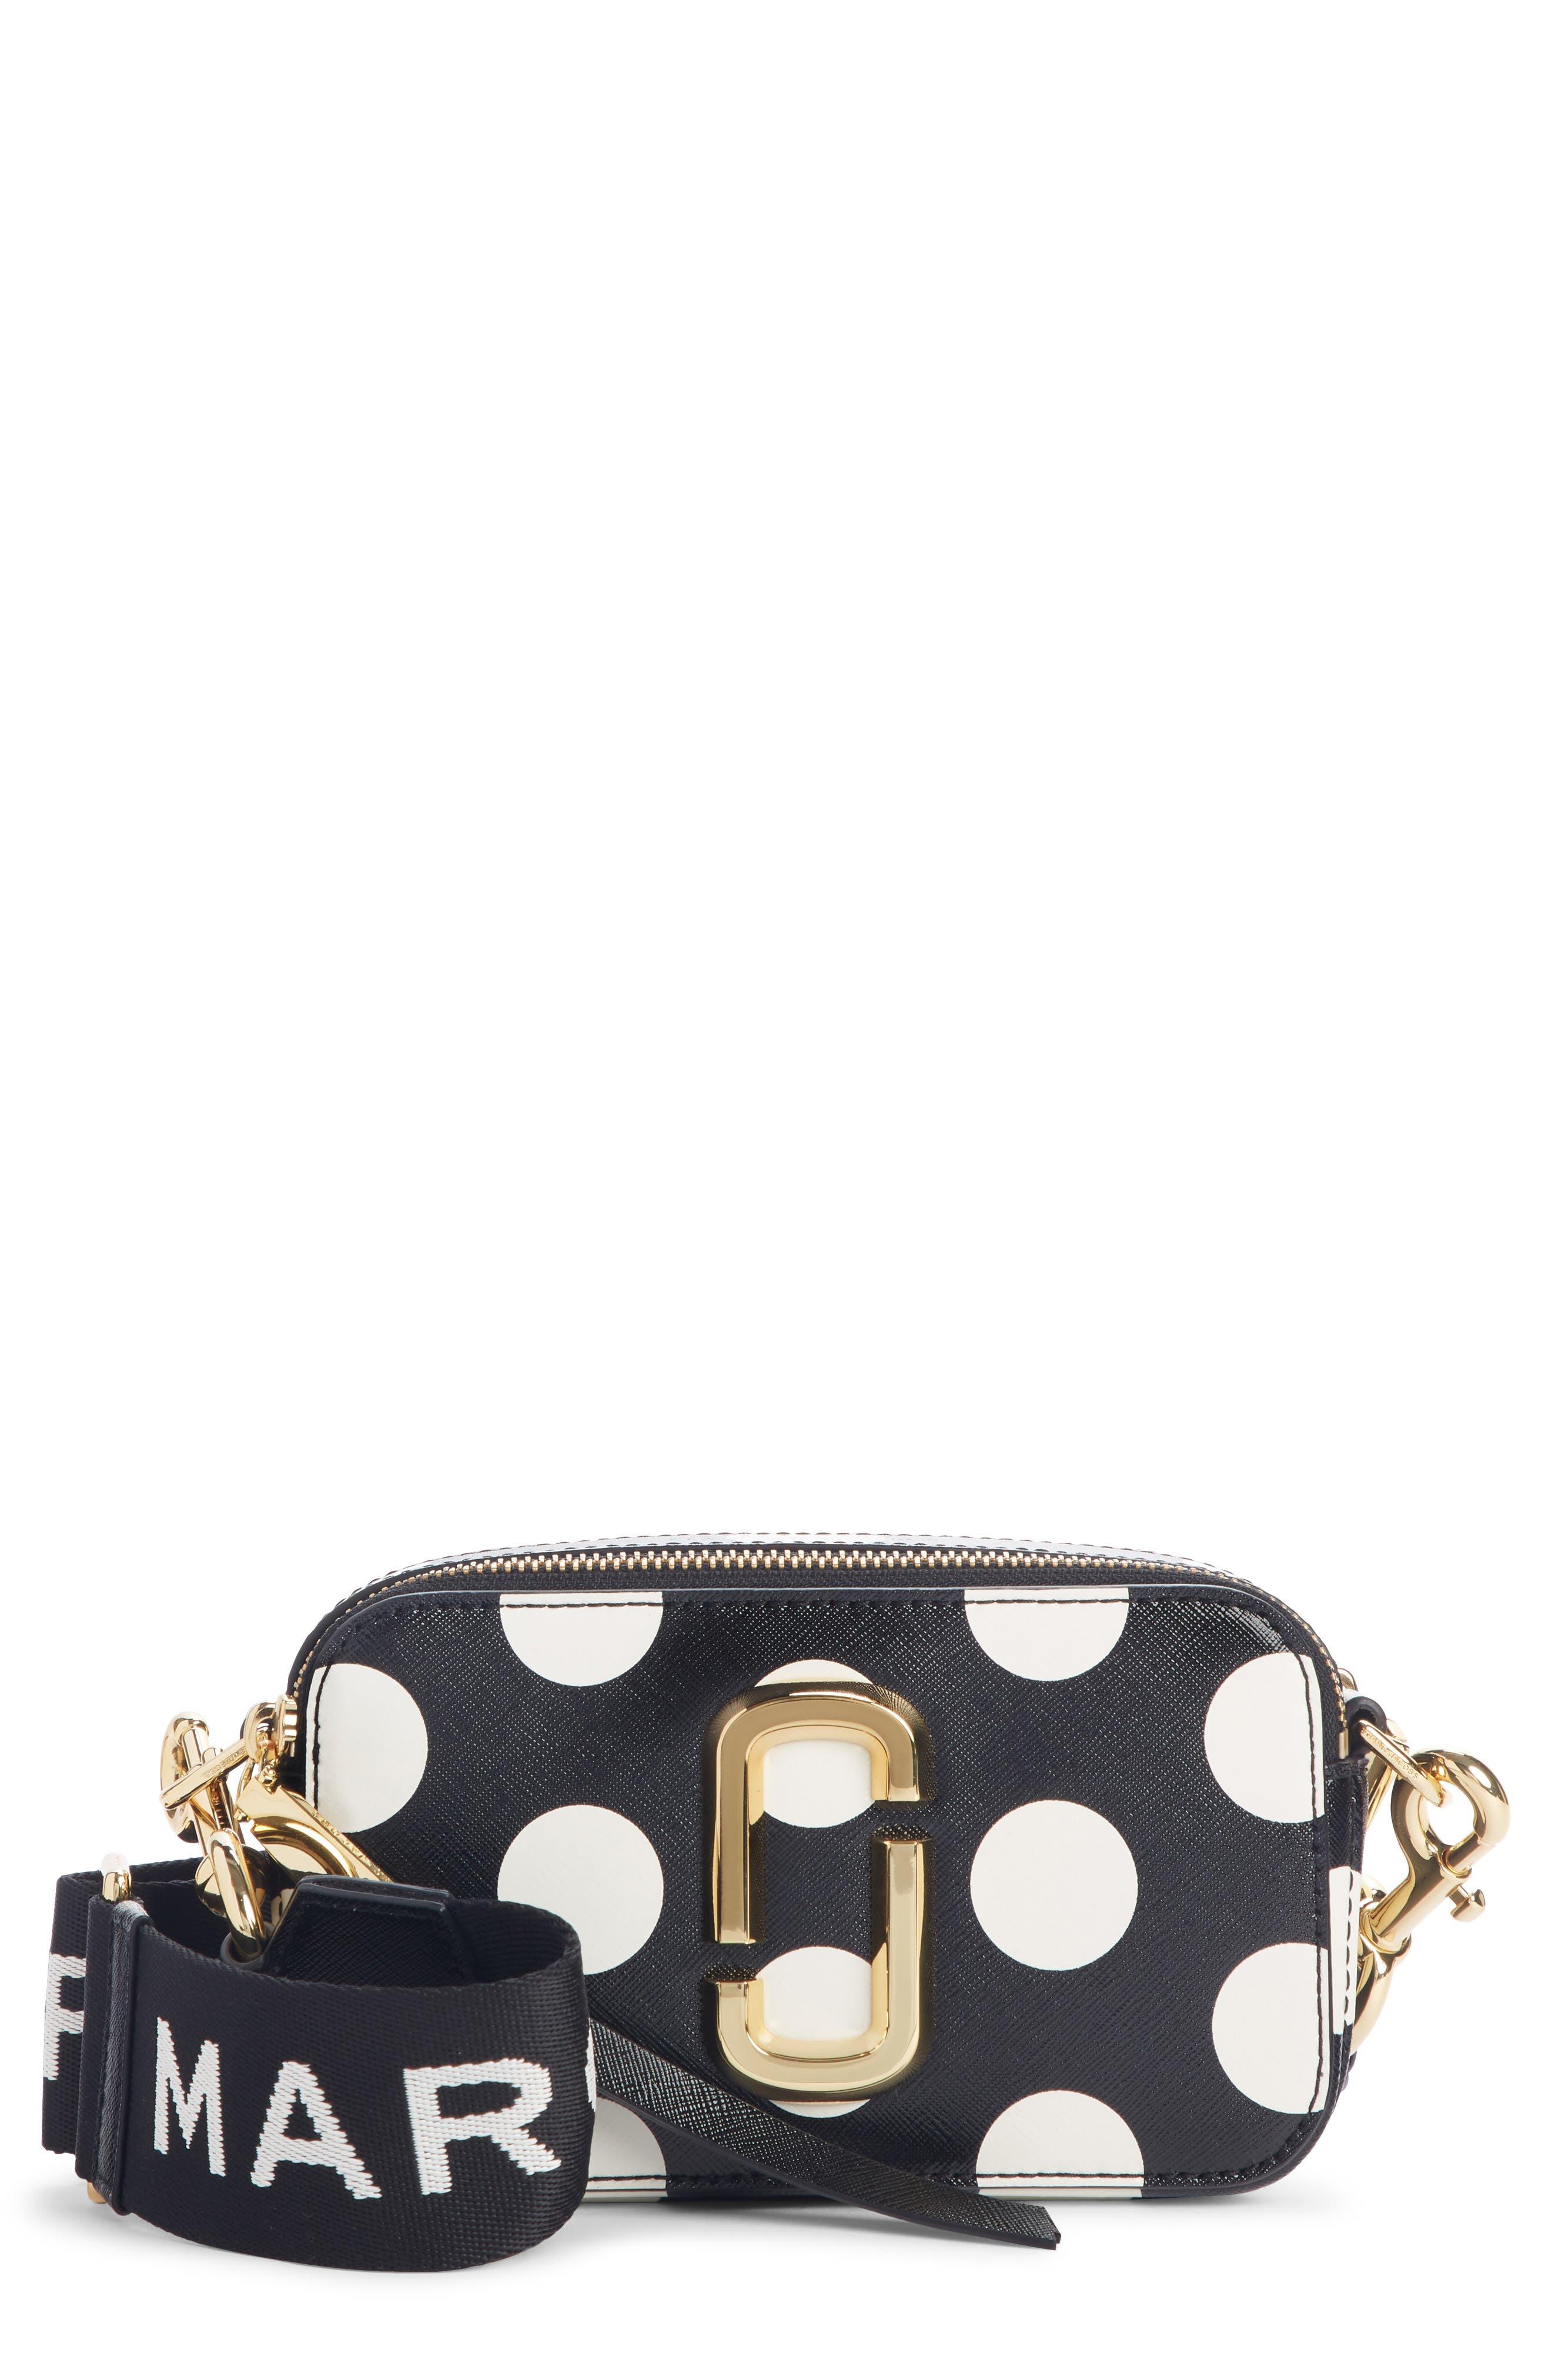 Dot Snapshot Leather Crossbody Bag, Main, color, BLACK MULTI